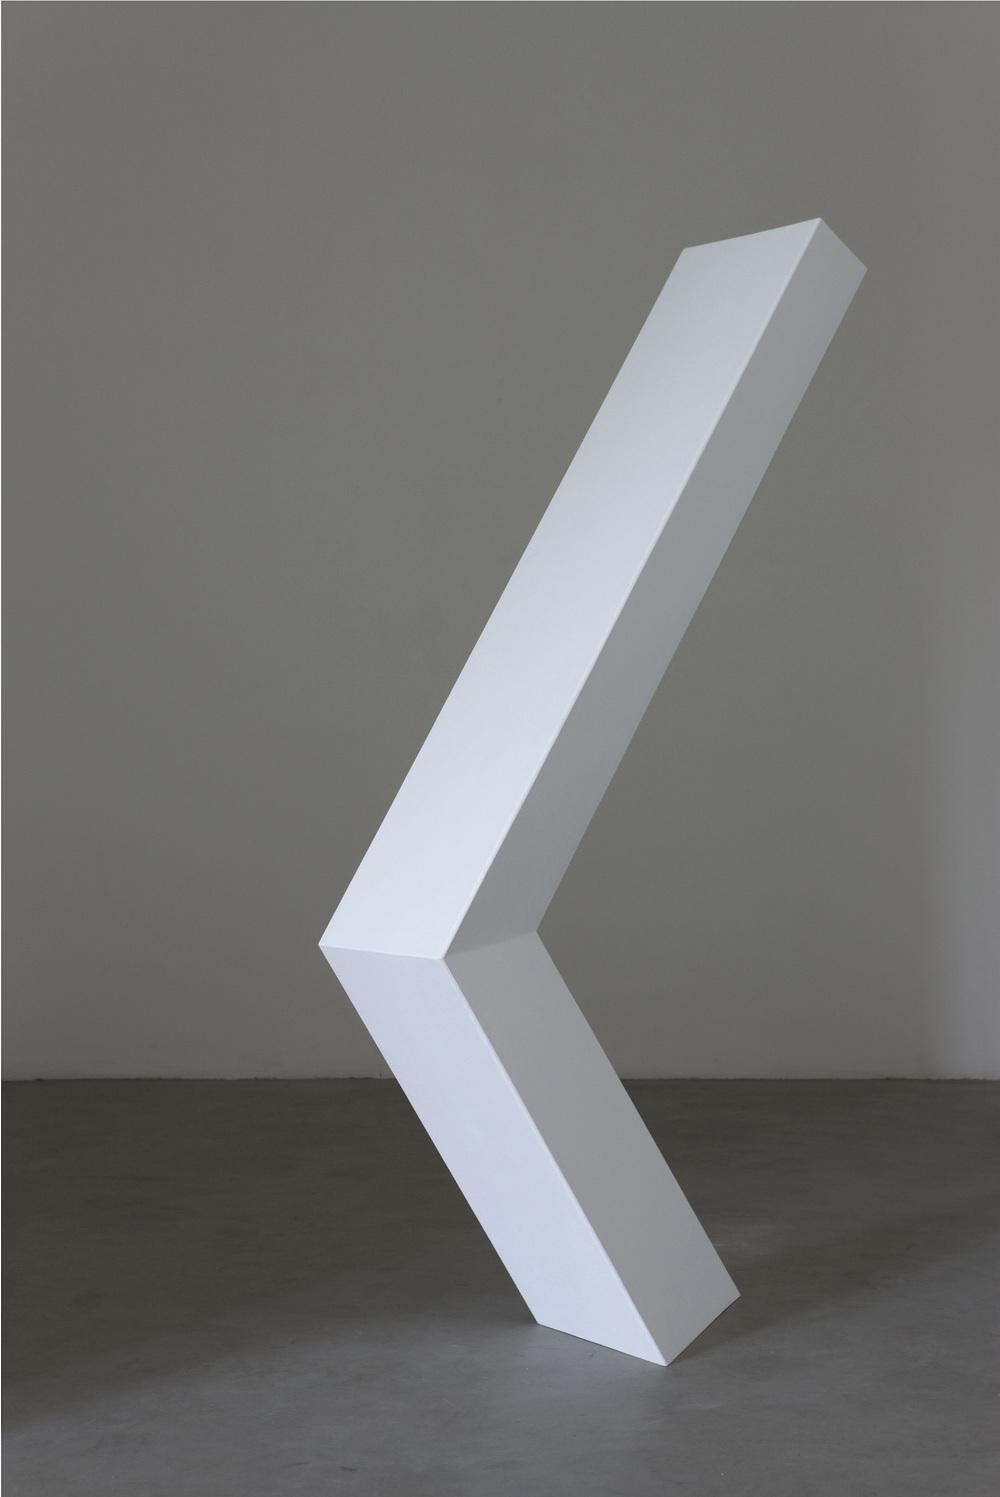 32-untitled(white sculpture)2008.jpeg